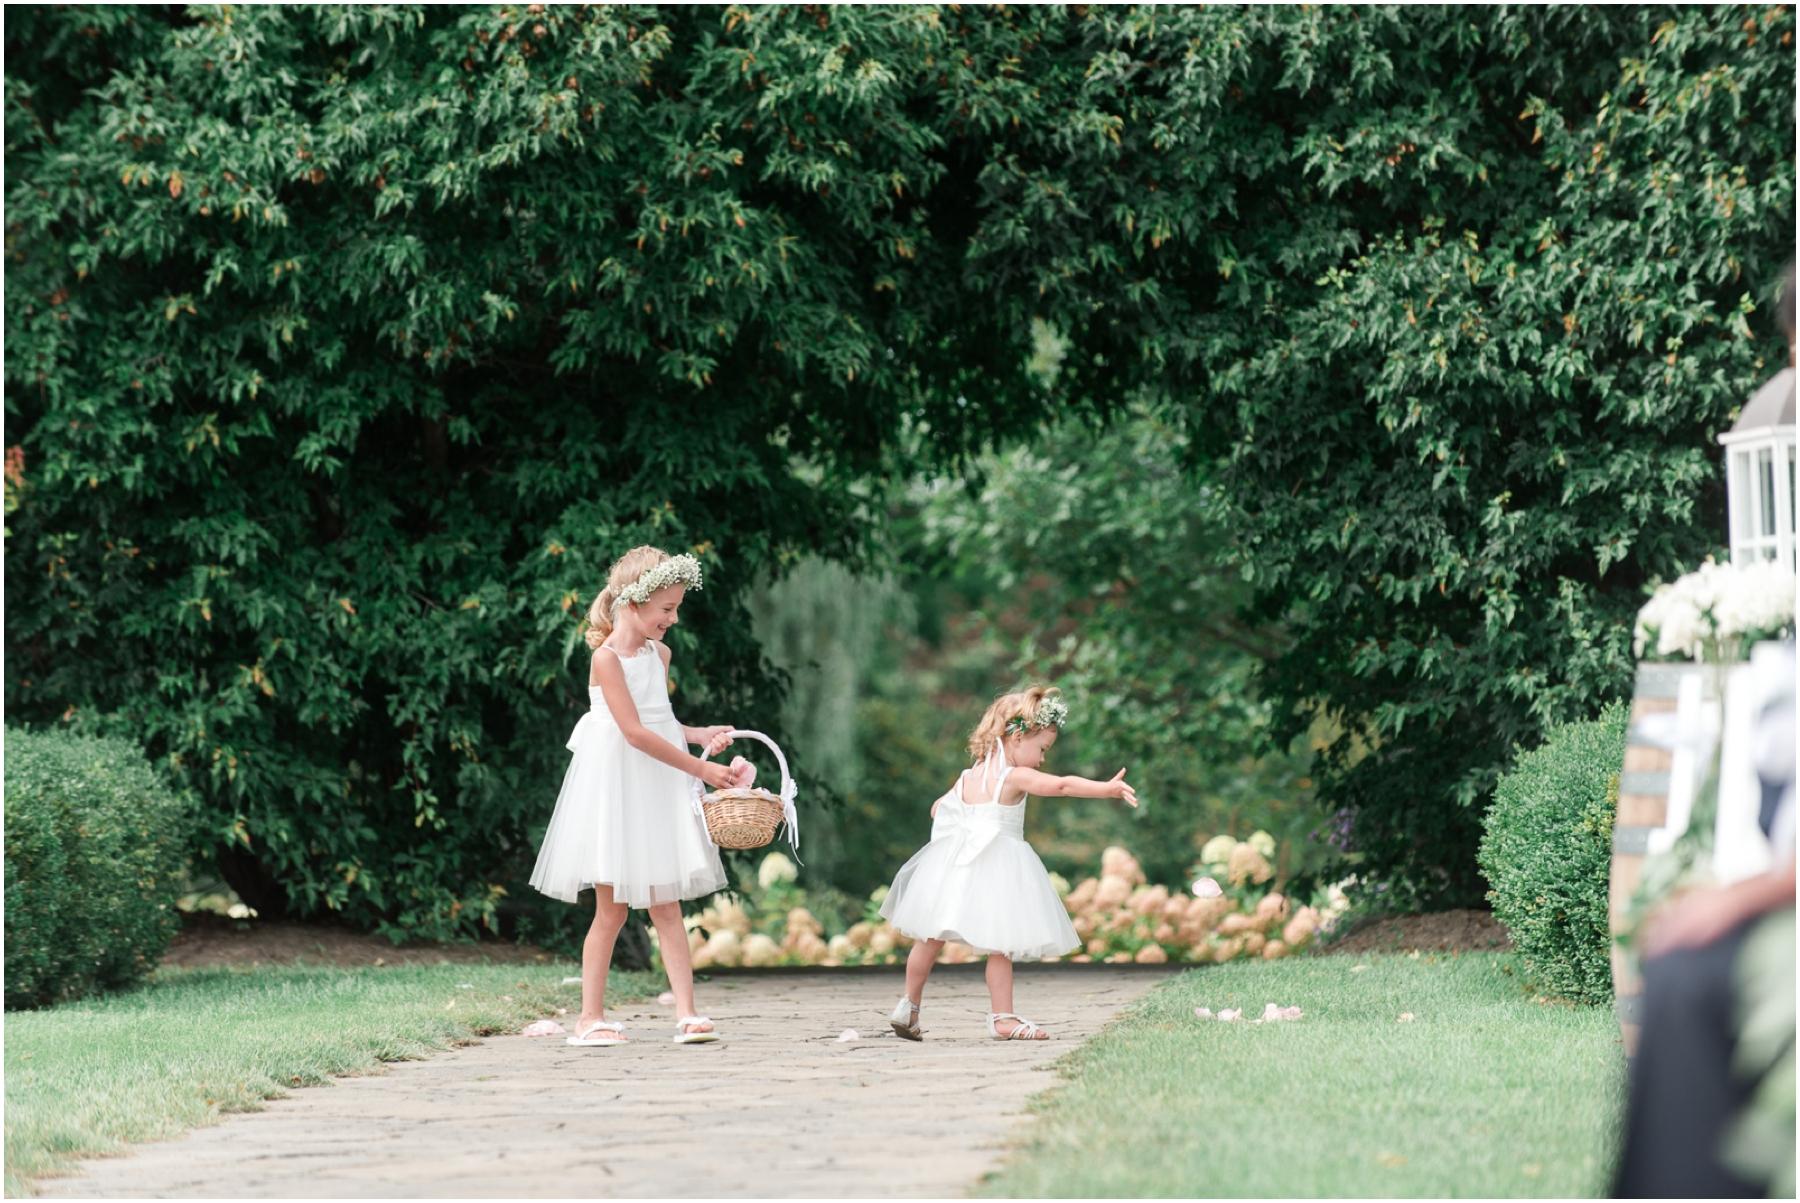 Bloom Field Gardens Wedding Precious Photography Katherine & Chris_035